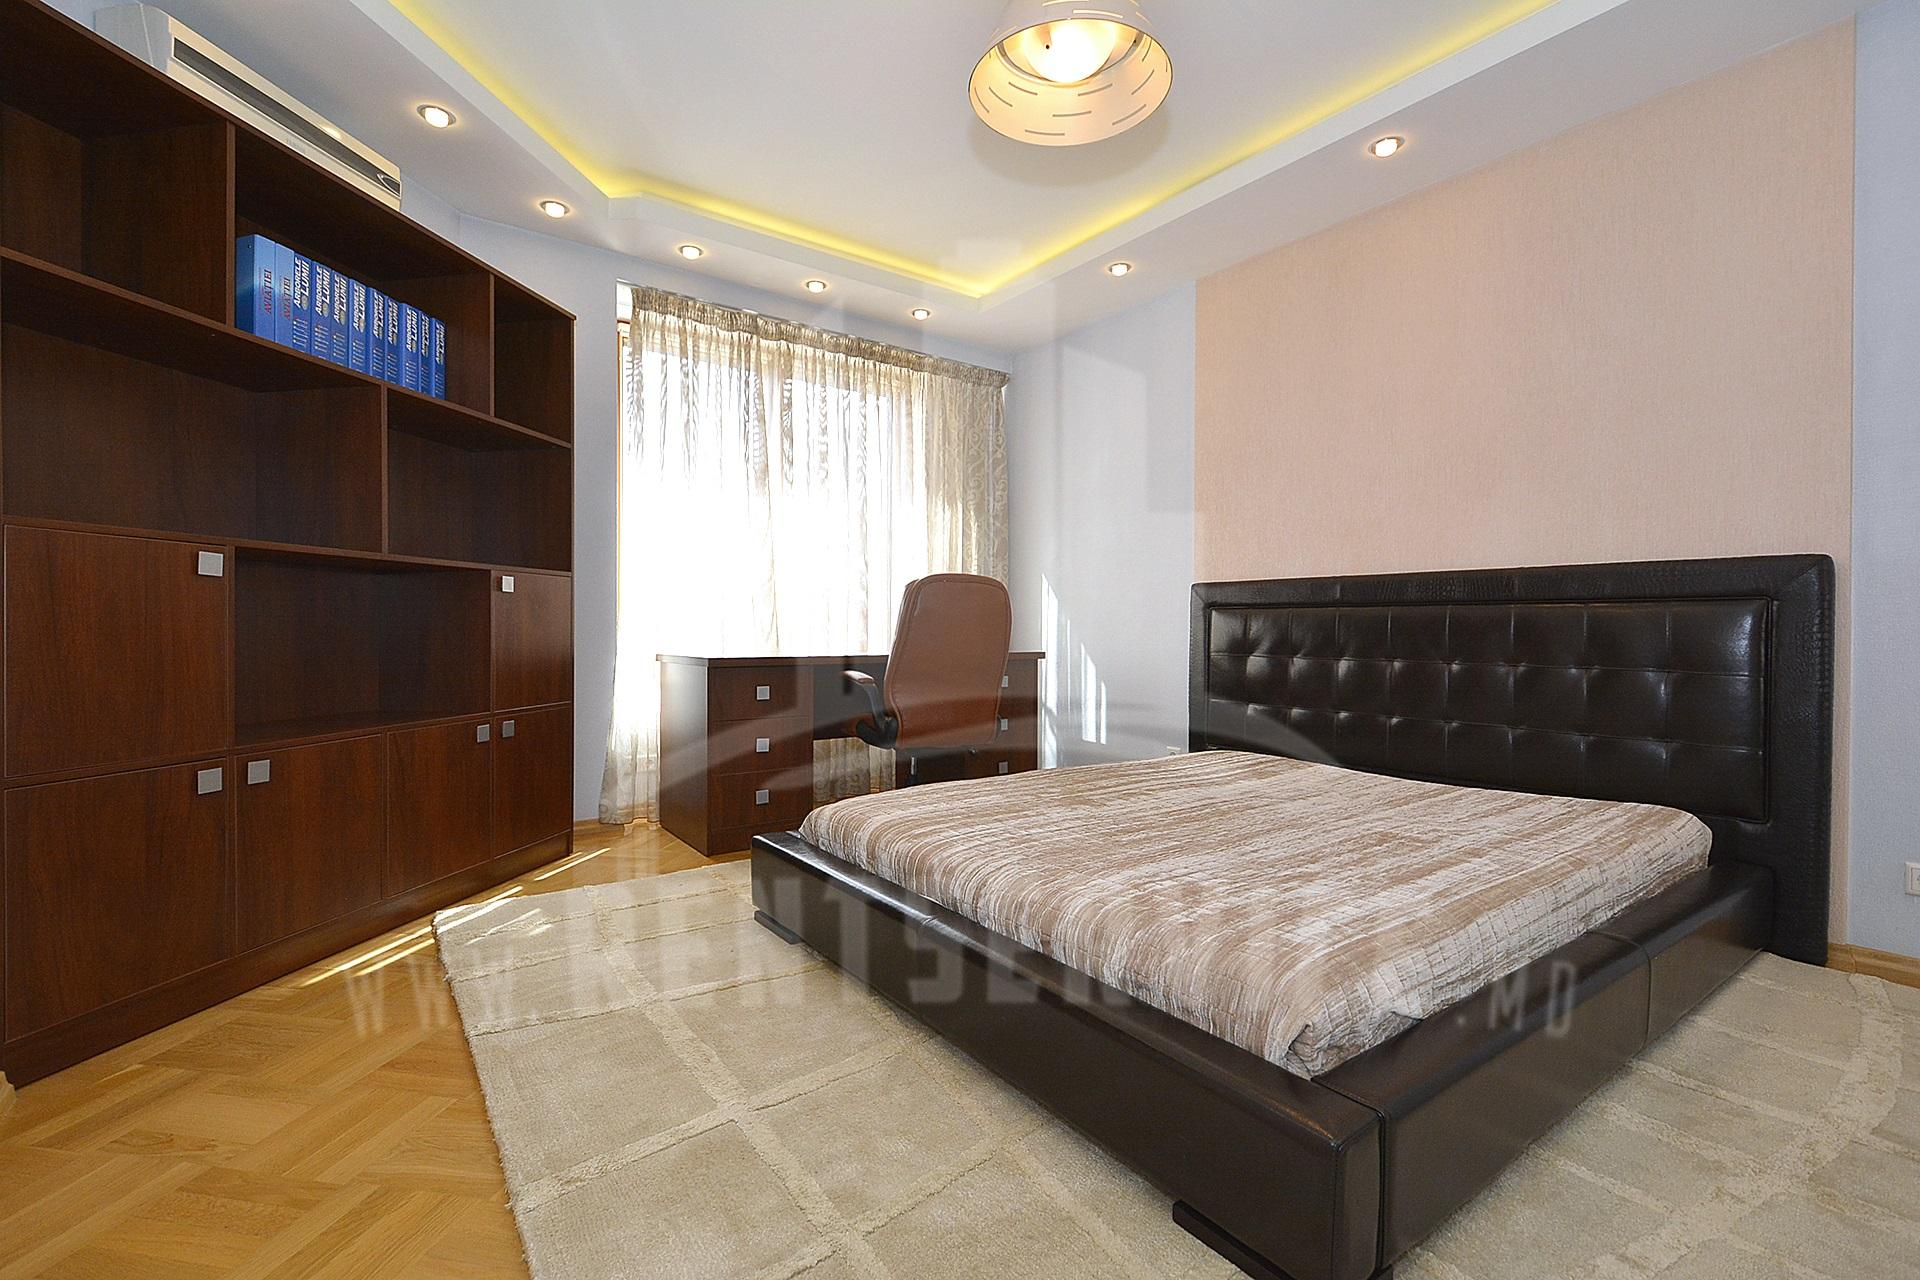 284_apartment_6.JPG